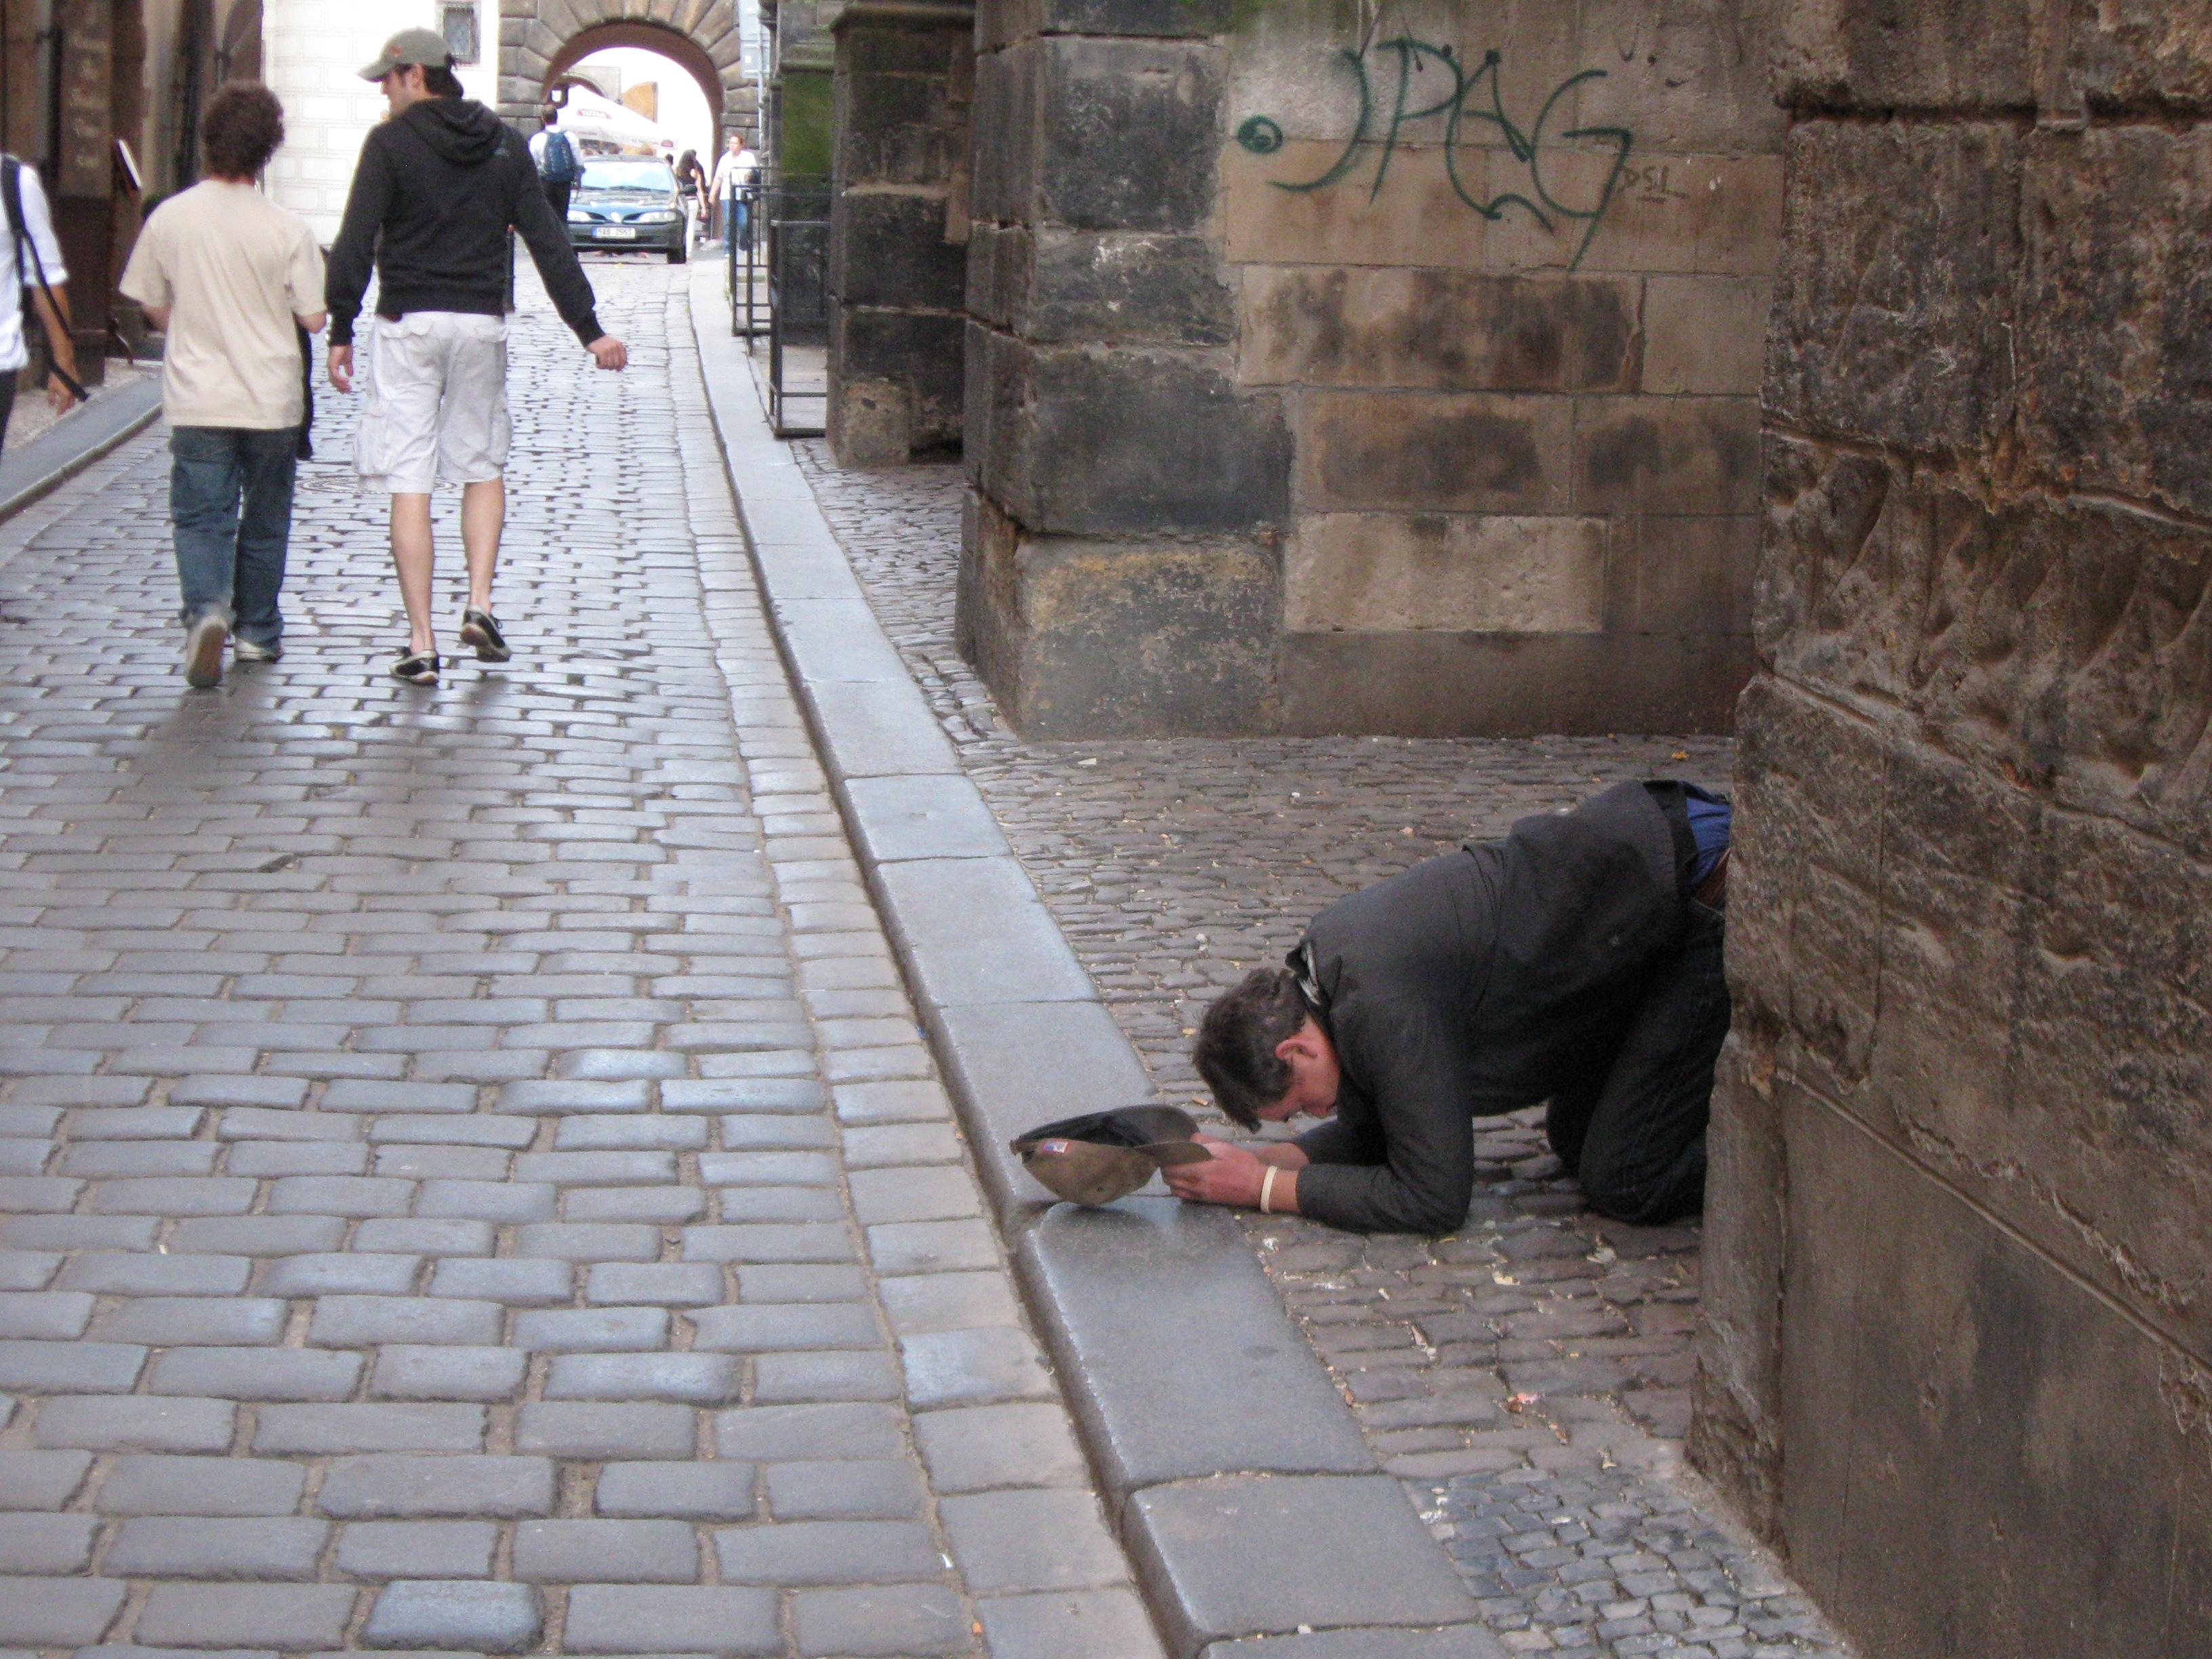 https://upload.wikimedia.org/wikipedia/commons/1/1d/%C5%BDebr%C3%A1k_v_T%C3%BDnsk%C3%A9_ulici_v_Praze.JPG